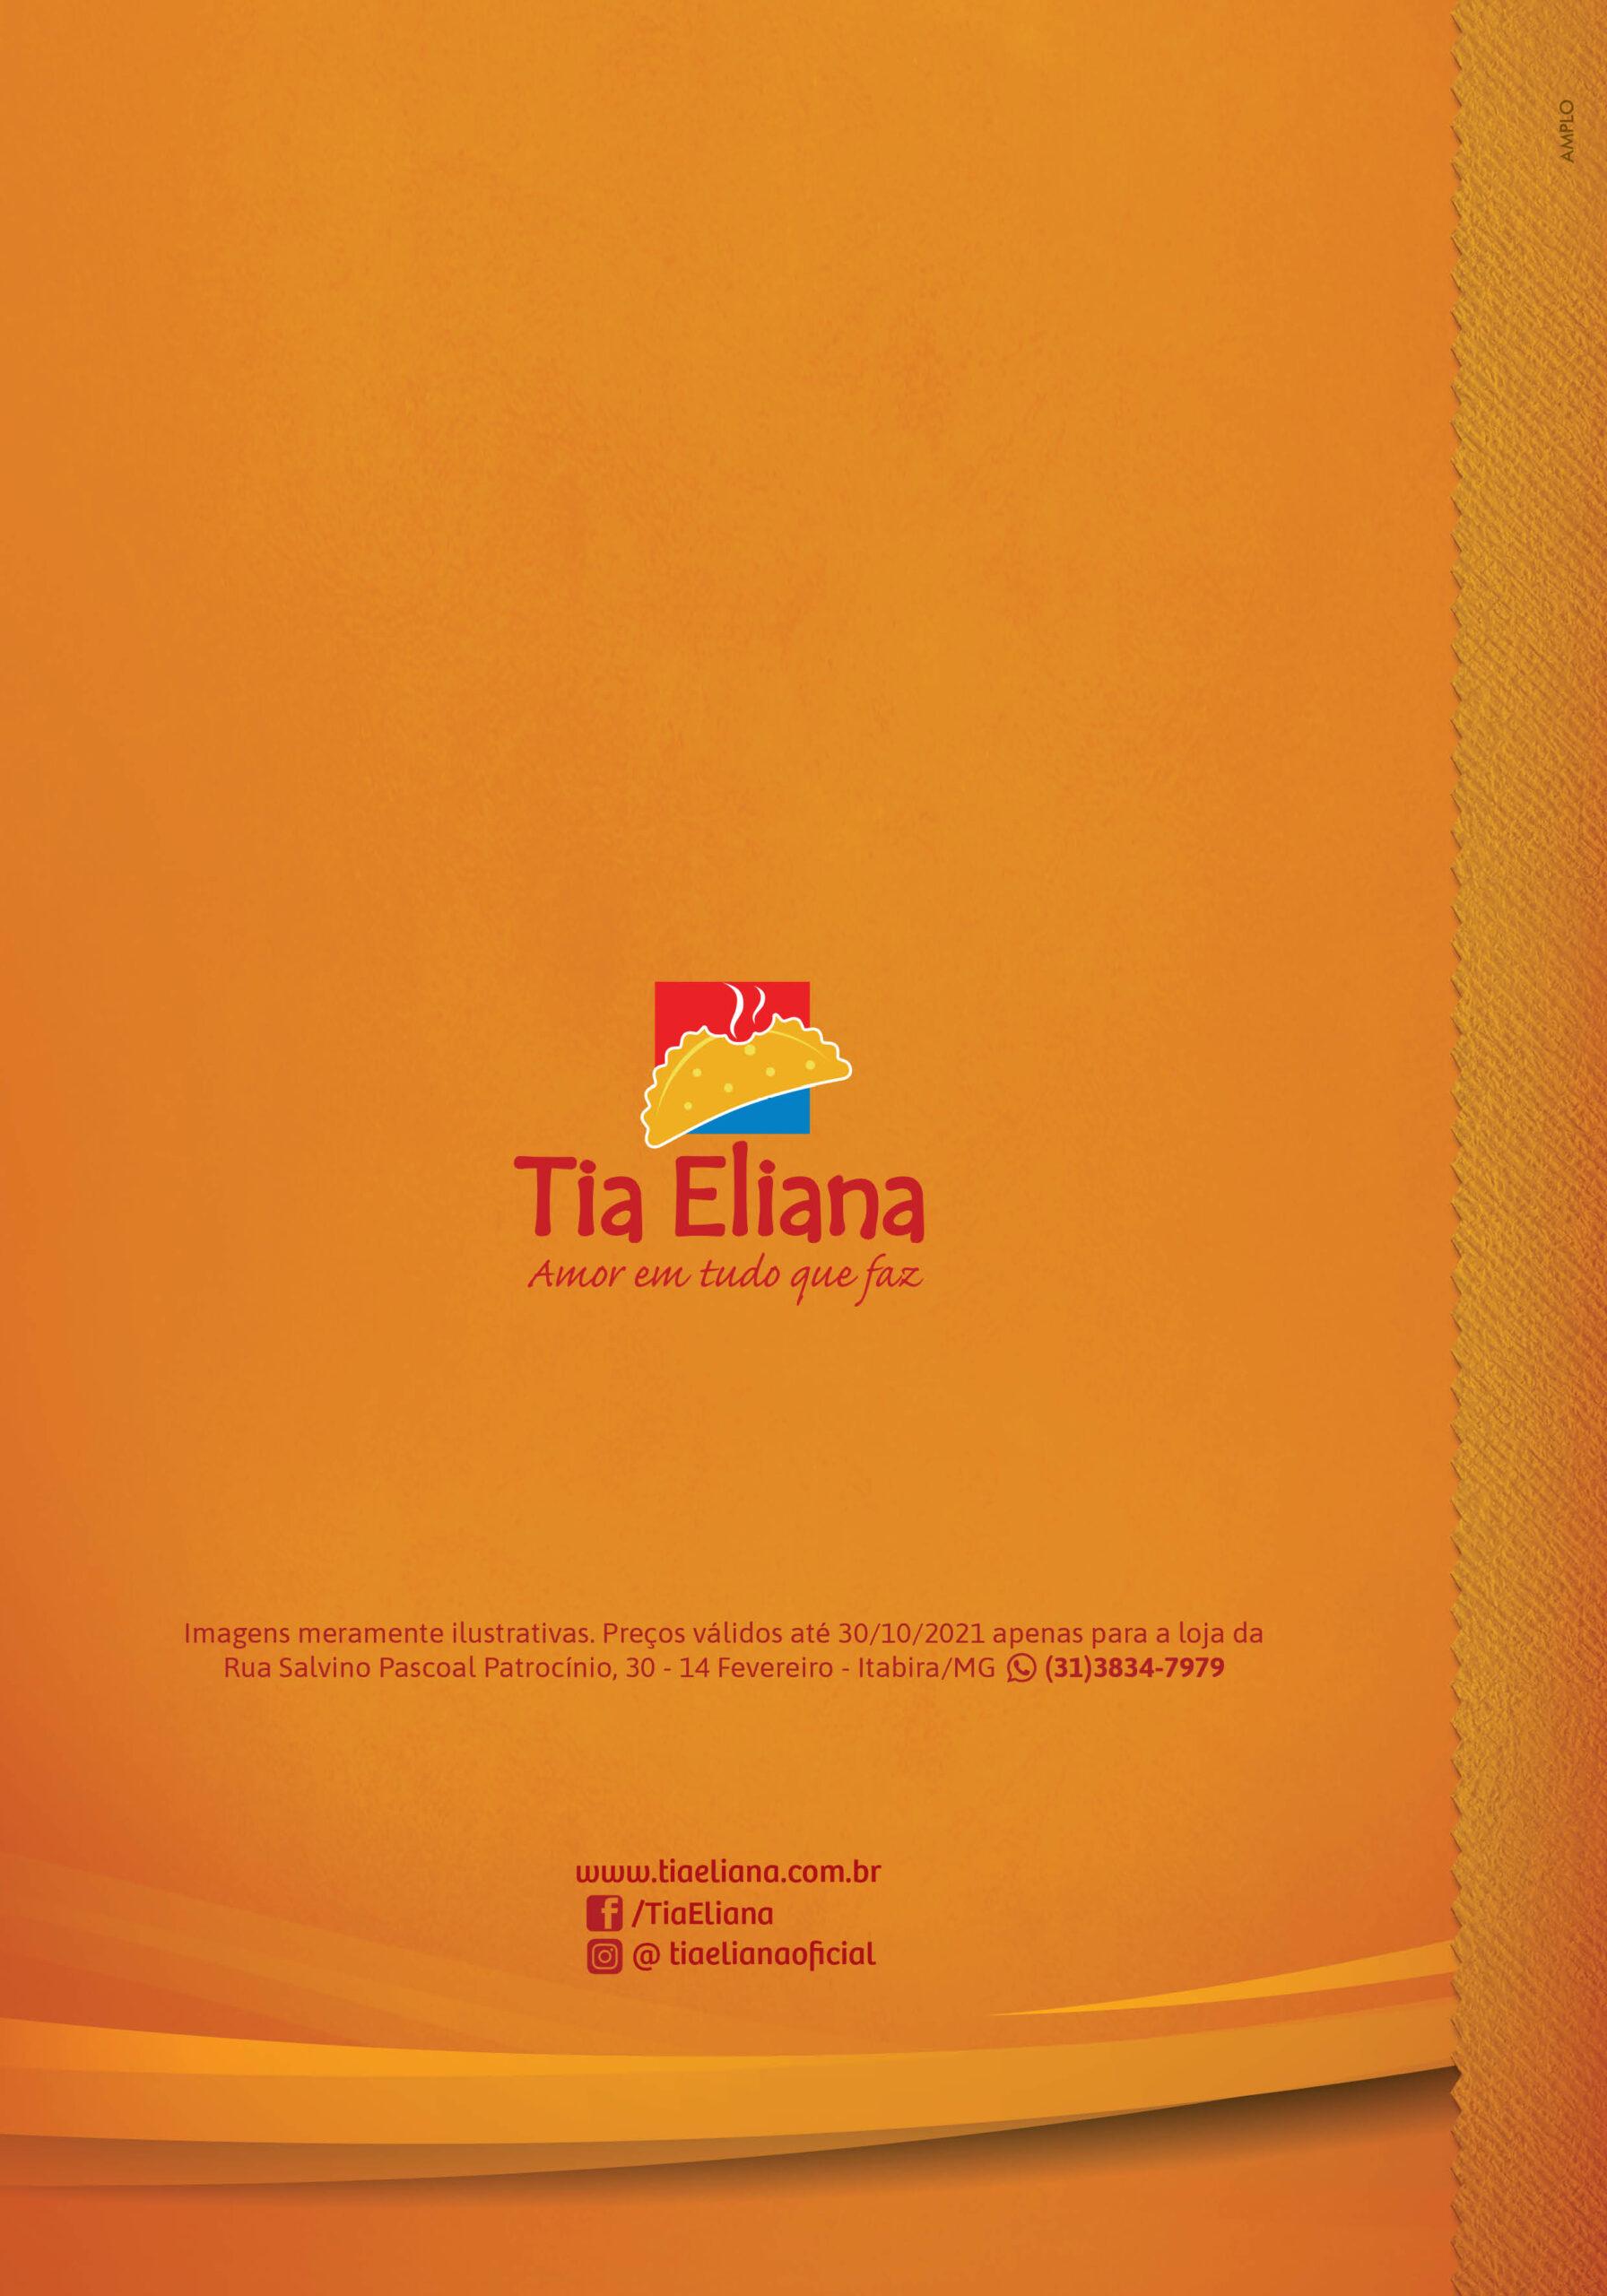 cardapio_completo_interior_a4_2021_tia_eliana_itabira_sp_V212-scaled Itabira - Salvino Pascoal